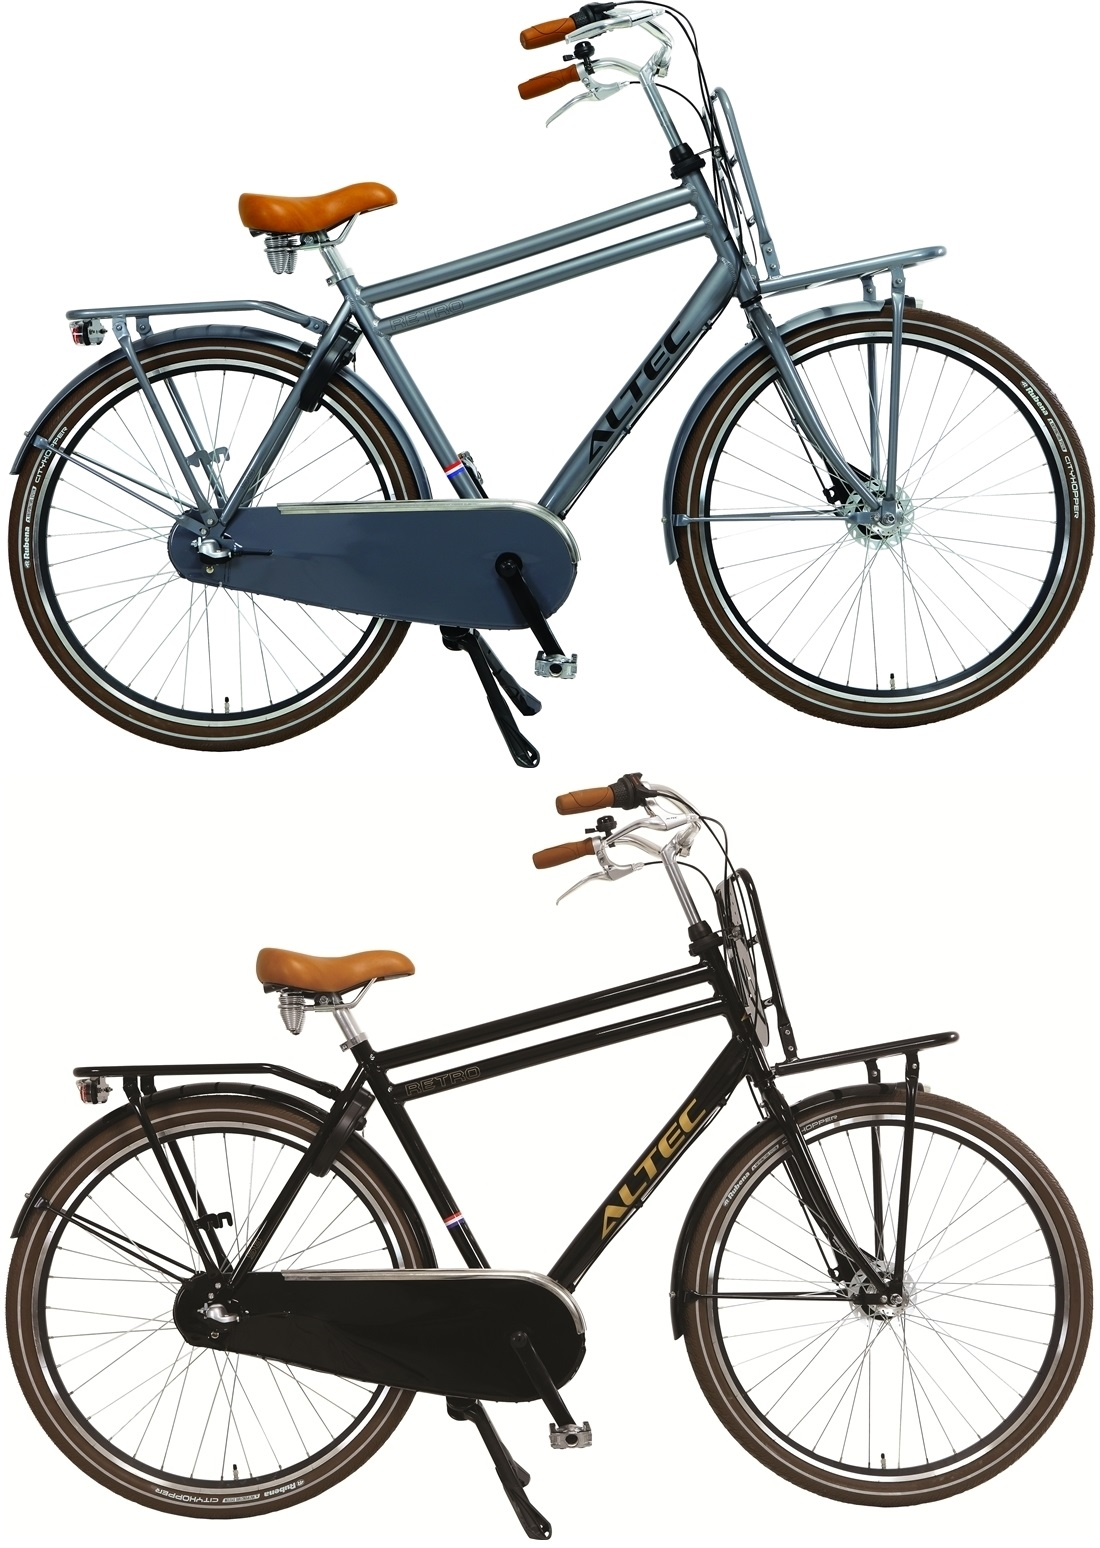 28 zoll herren holland fahrrad 3 gang hoopfietsen altec. Black Bedroom Furniture Sets. Home Design Ideas